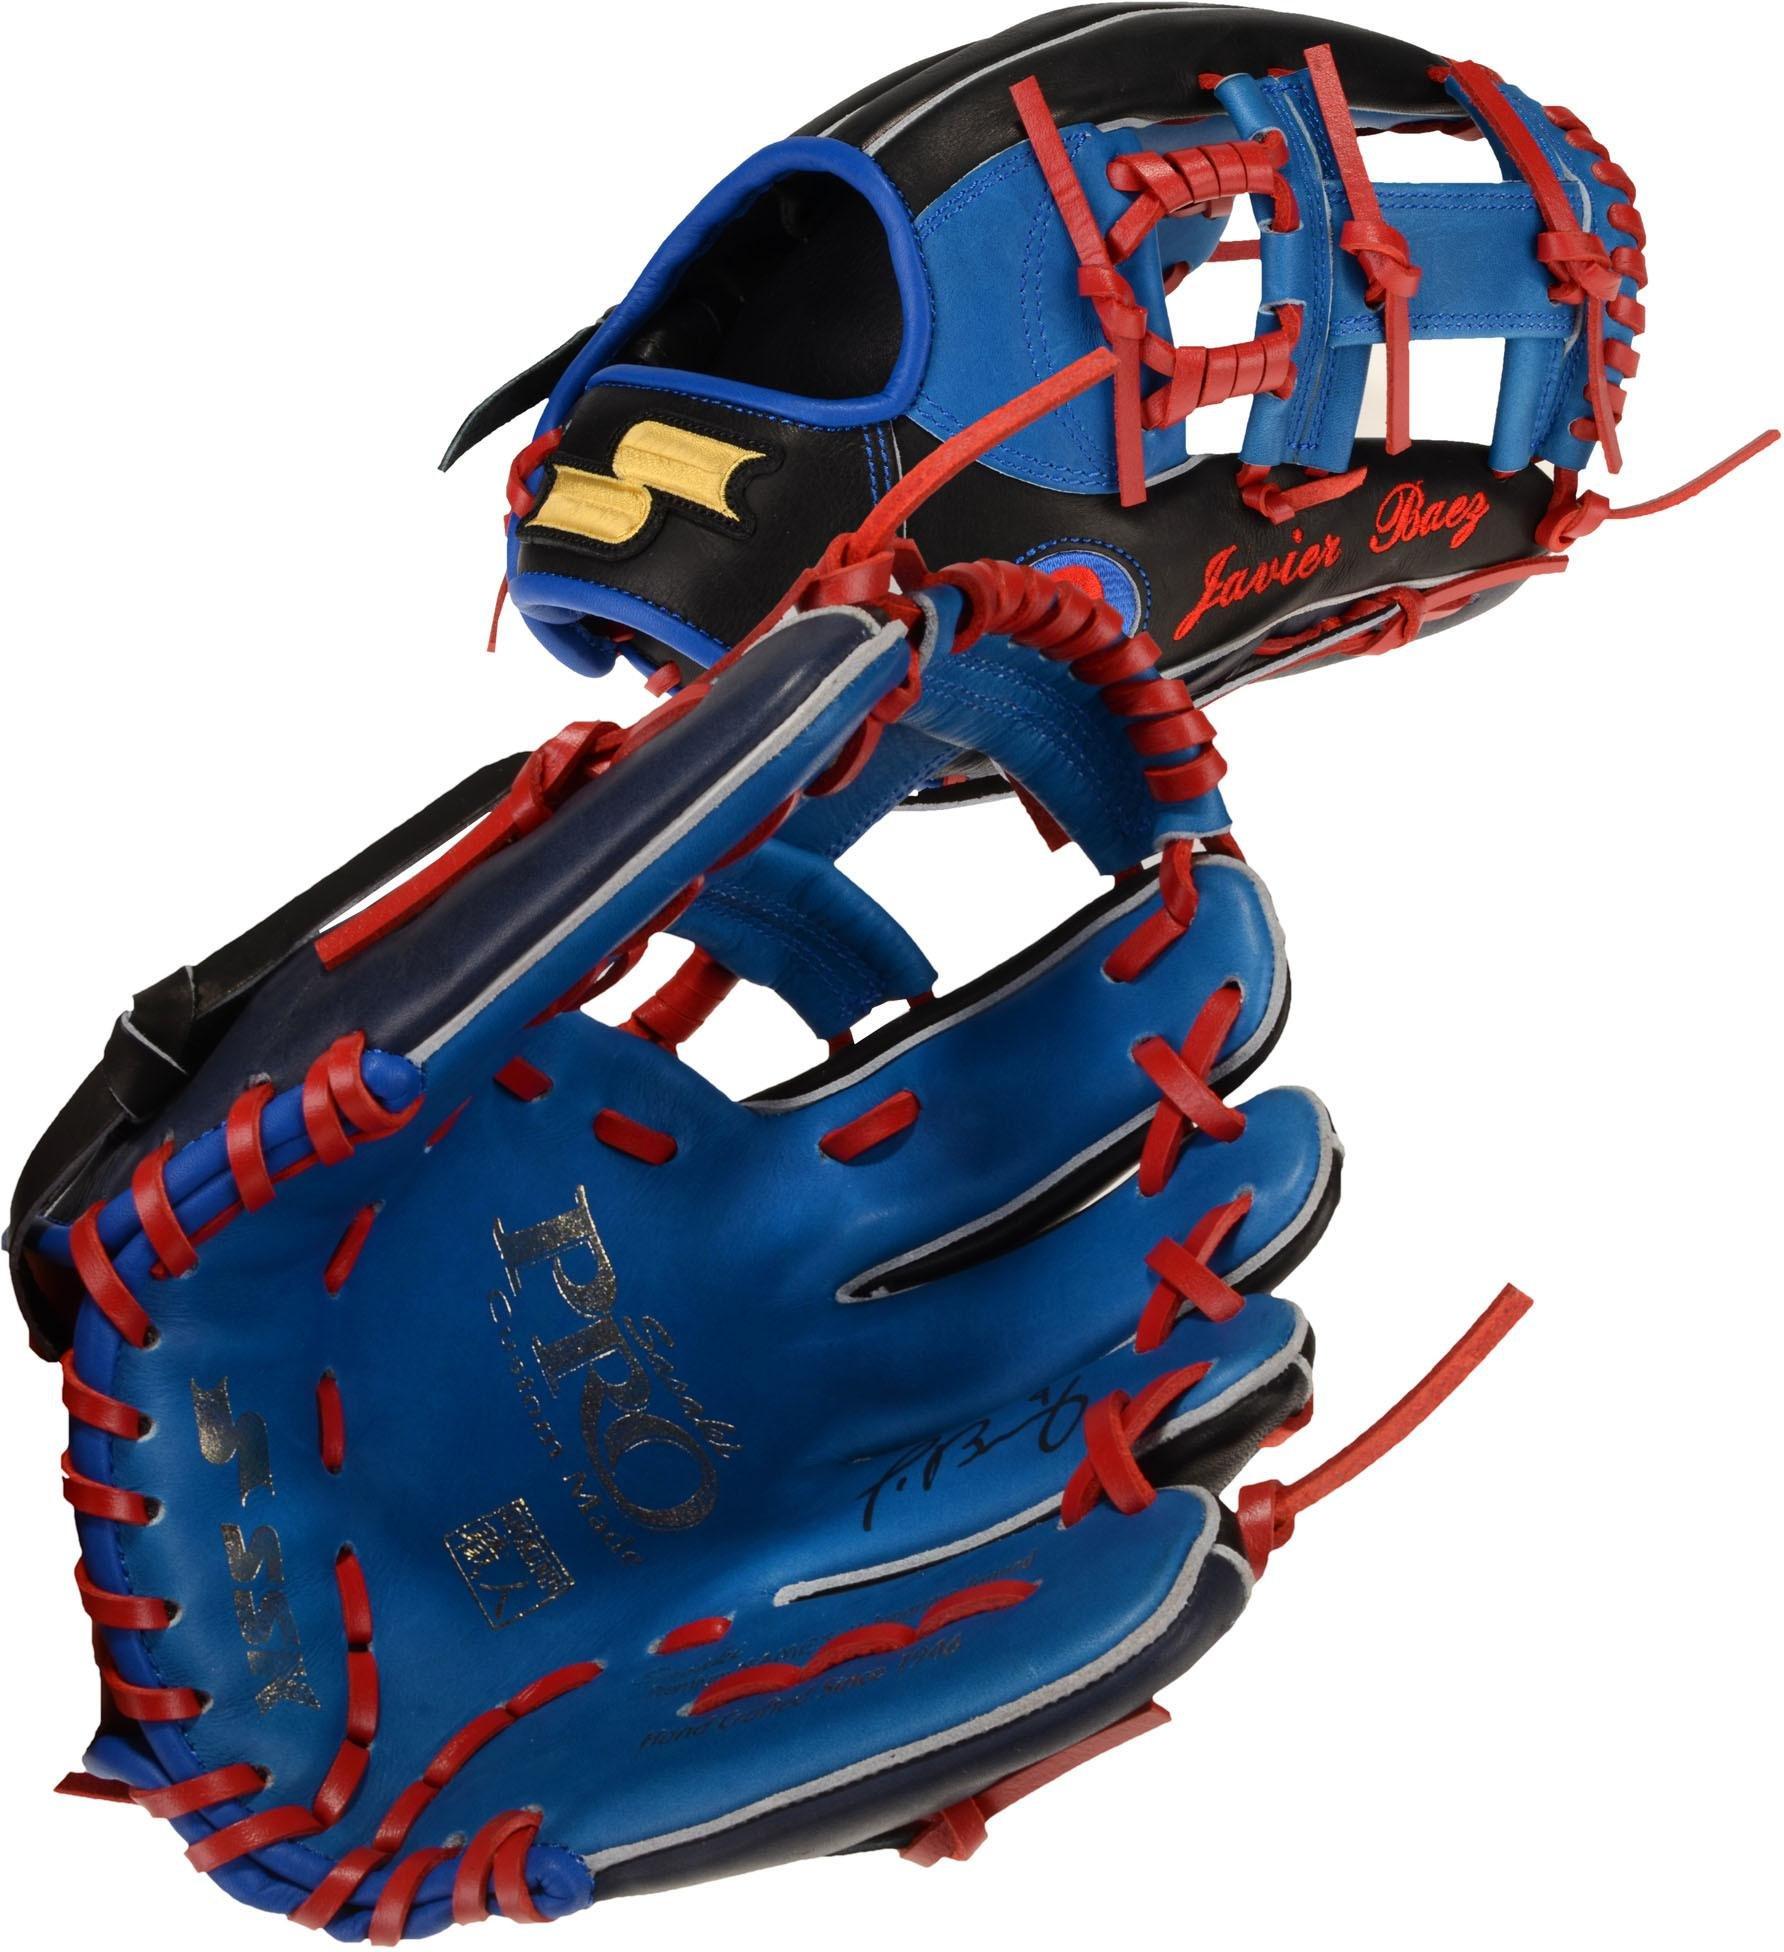 Javier Baez Chicago Cubs Autographed SSK Game Model Glove Fanatics Authentic Certified Autographed MLB Gloves